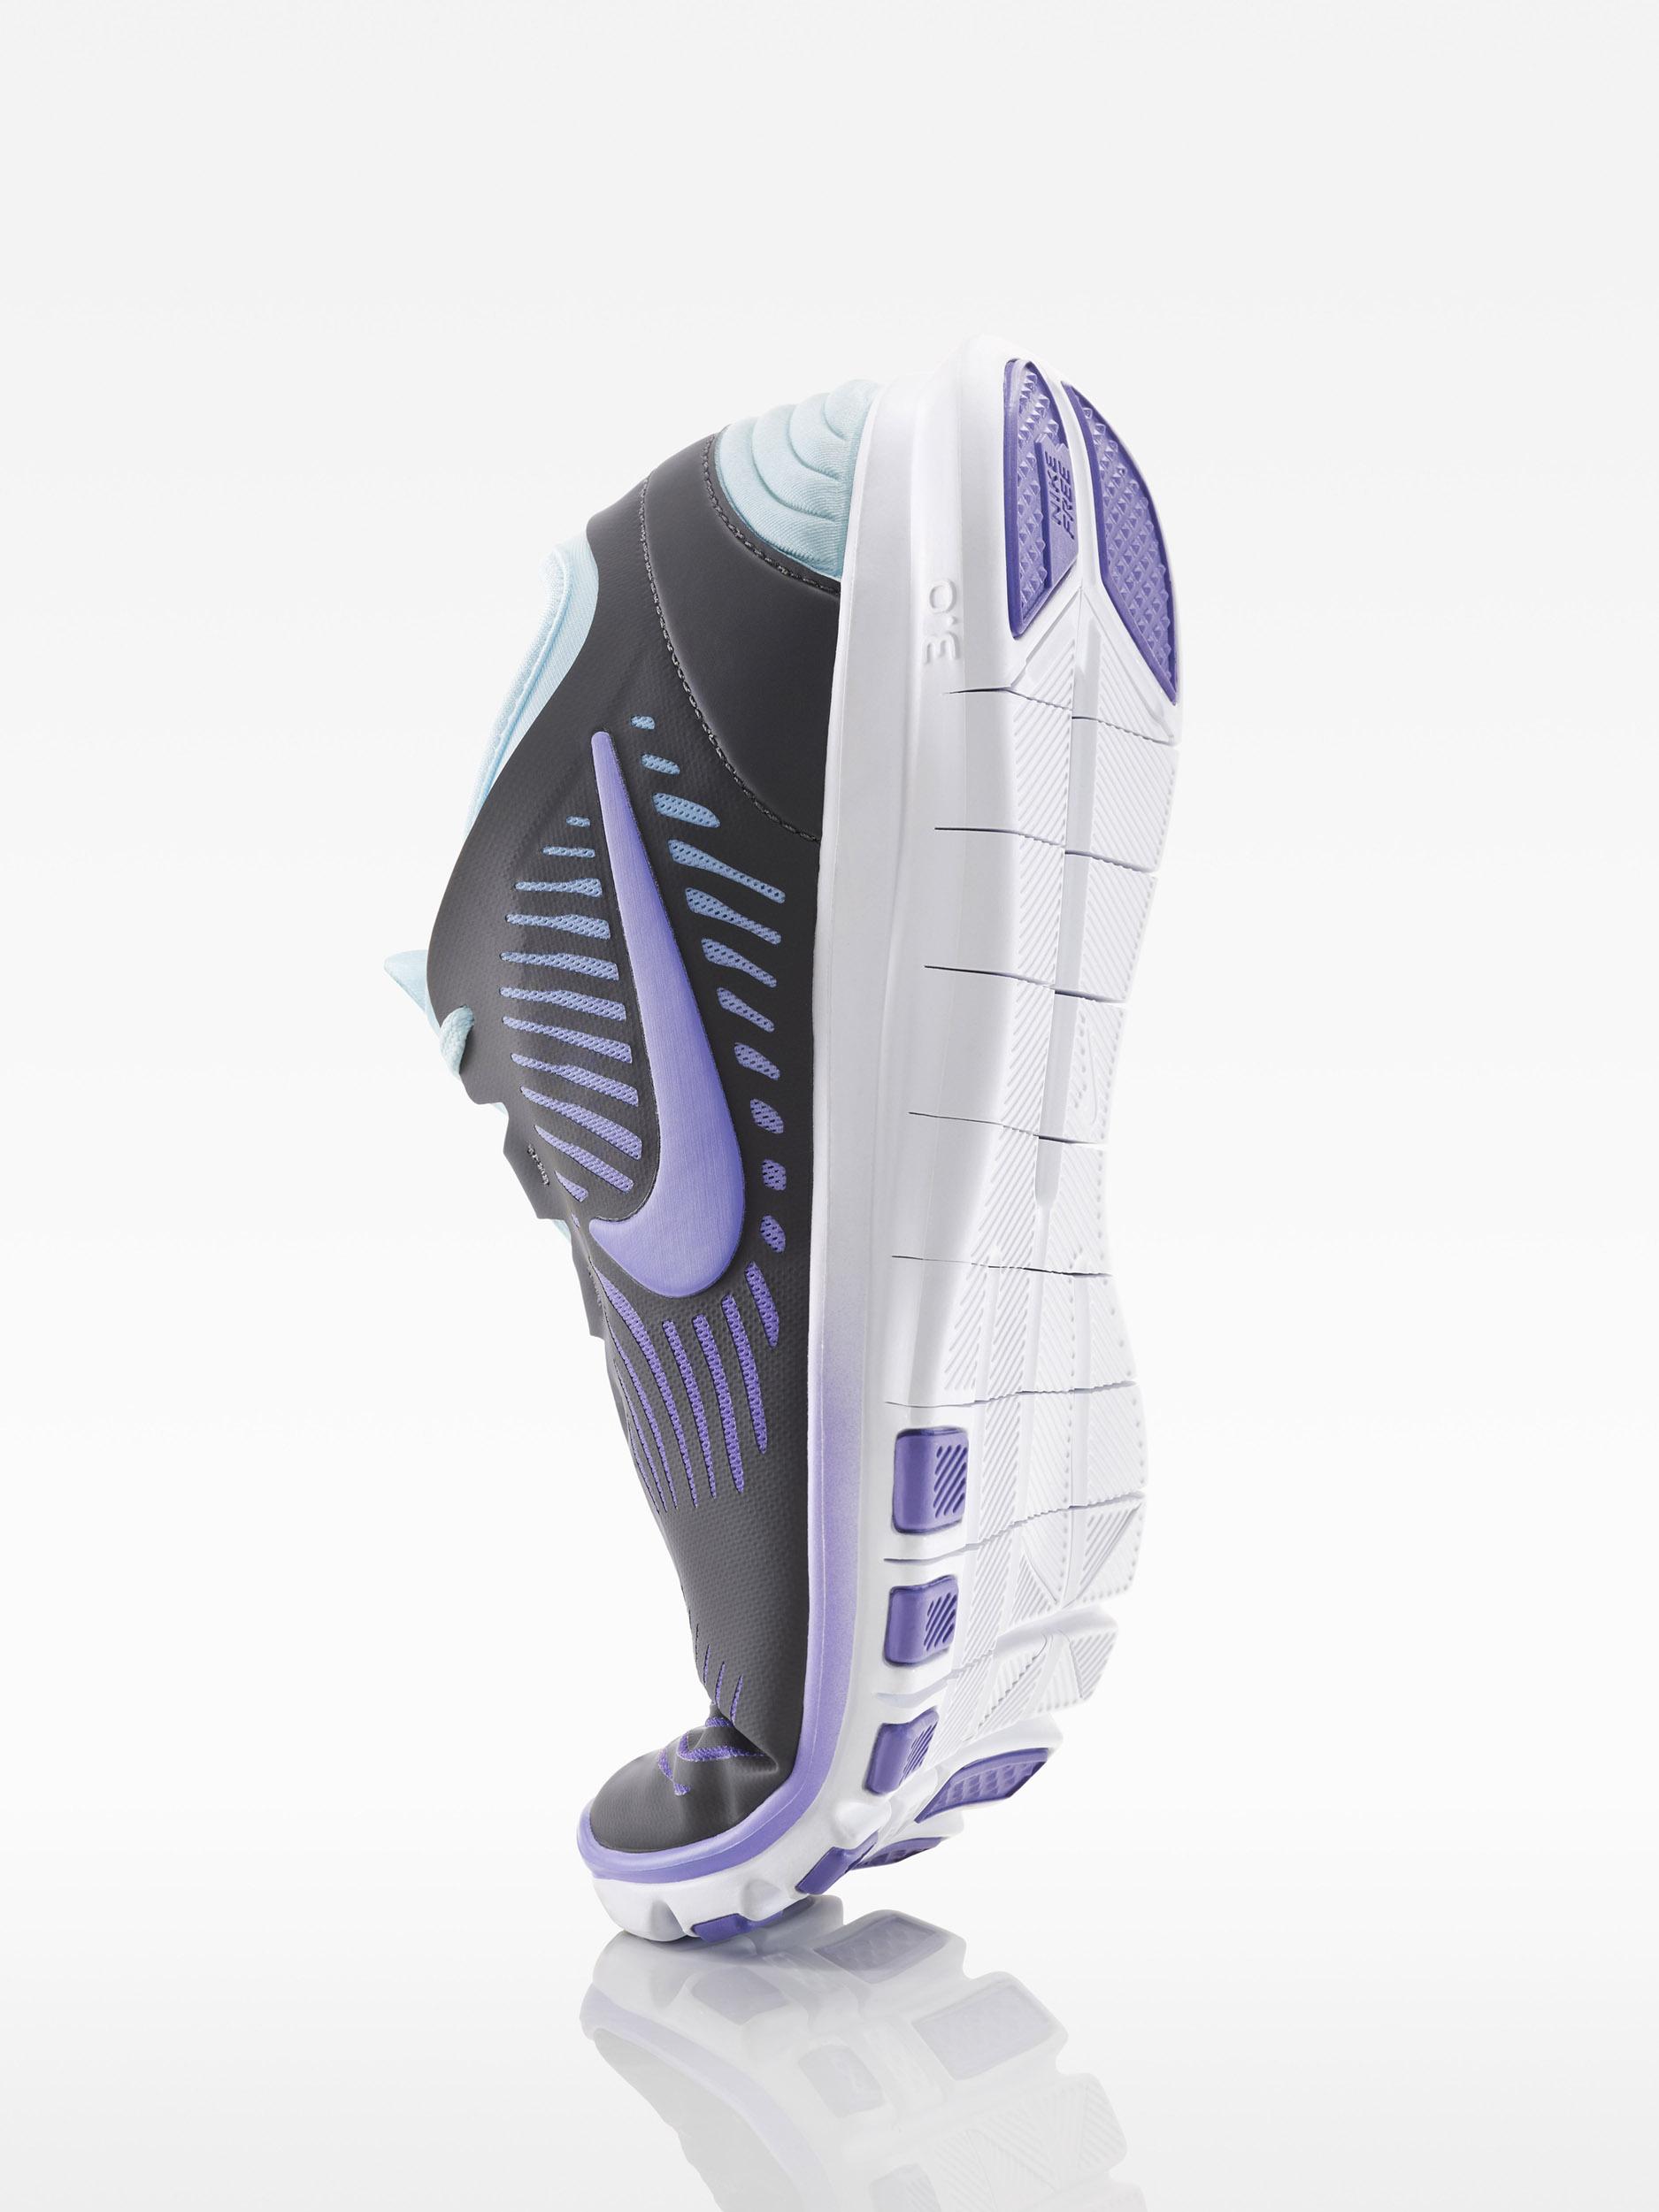 Nike_Factry_Jan_Init_Balanza_Hero_small.jpg